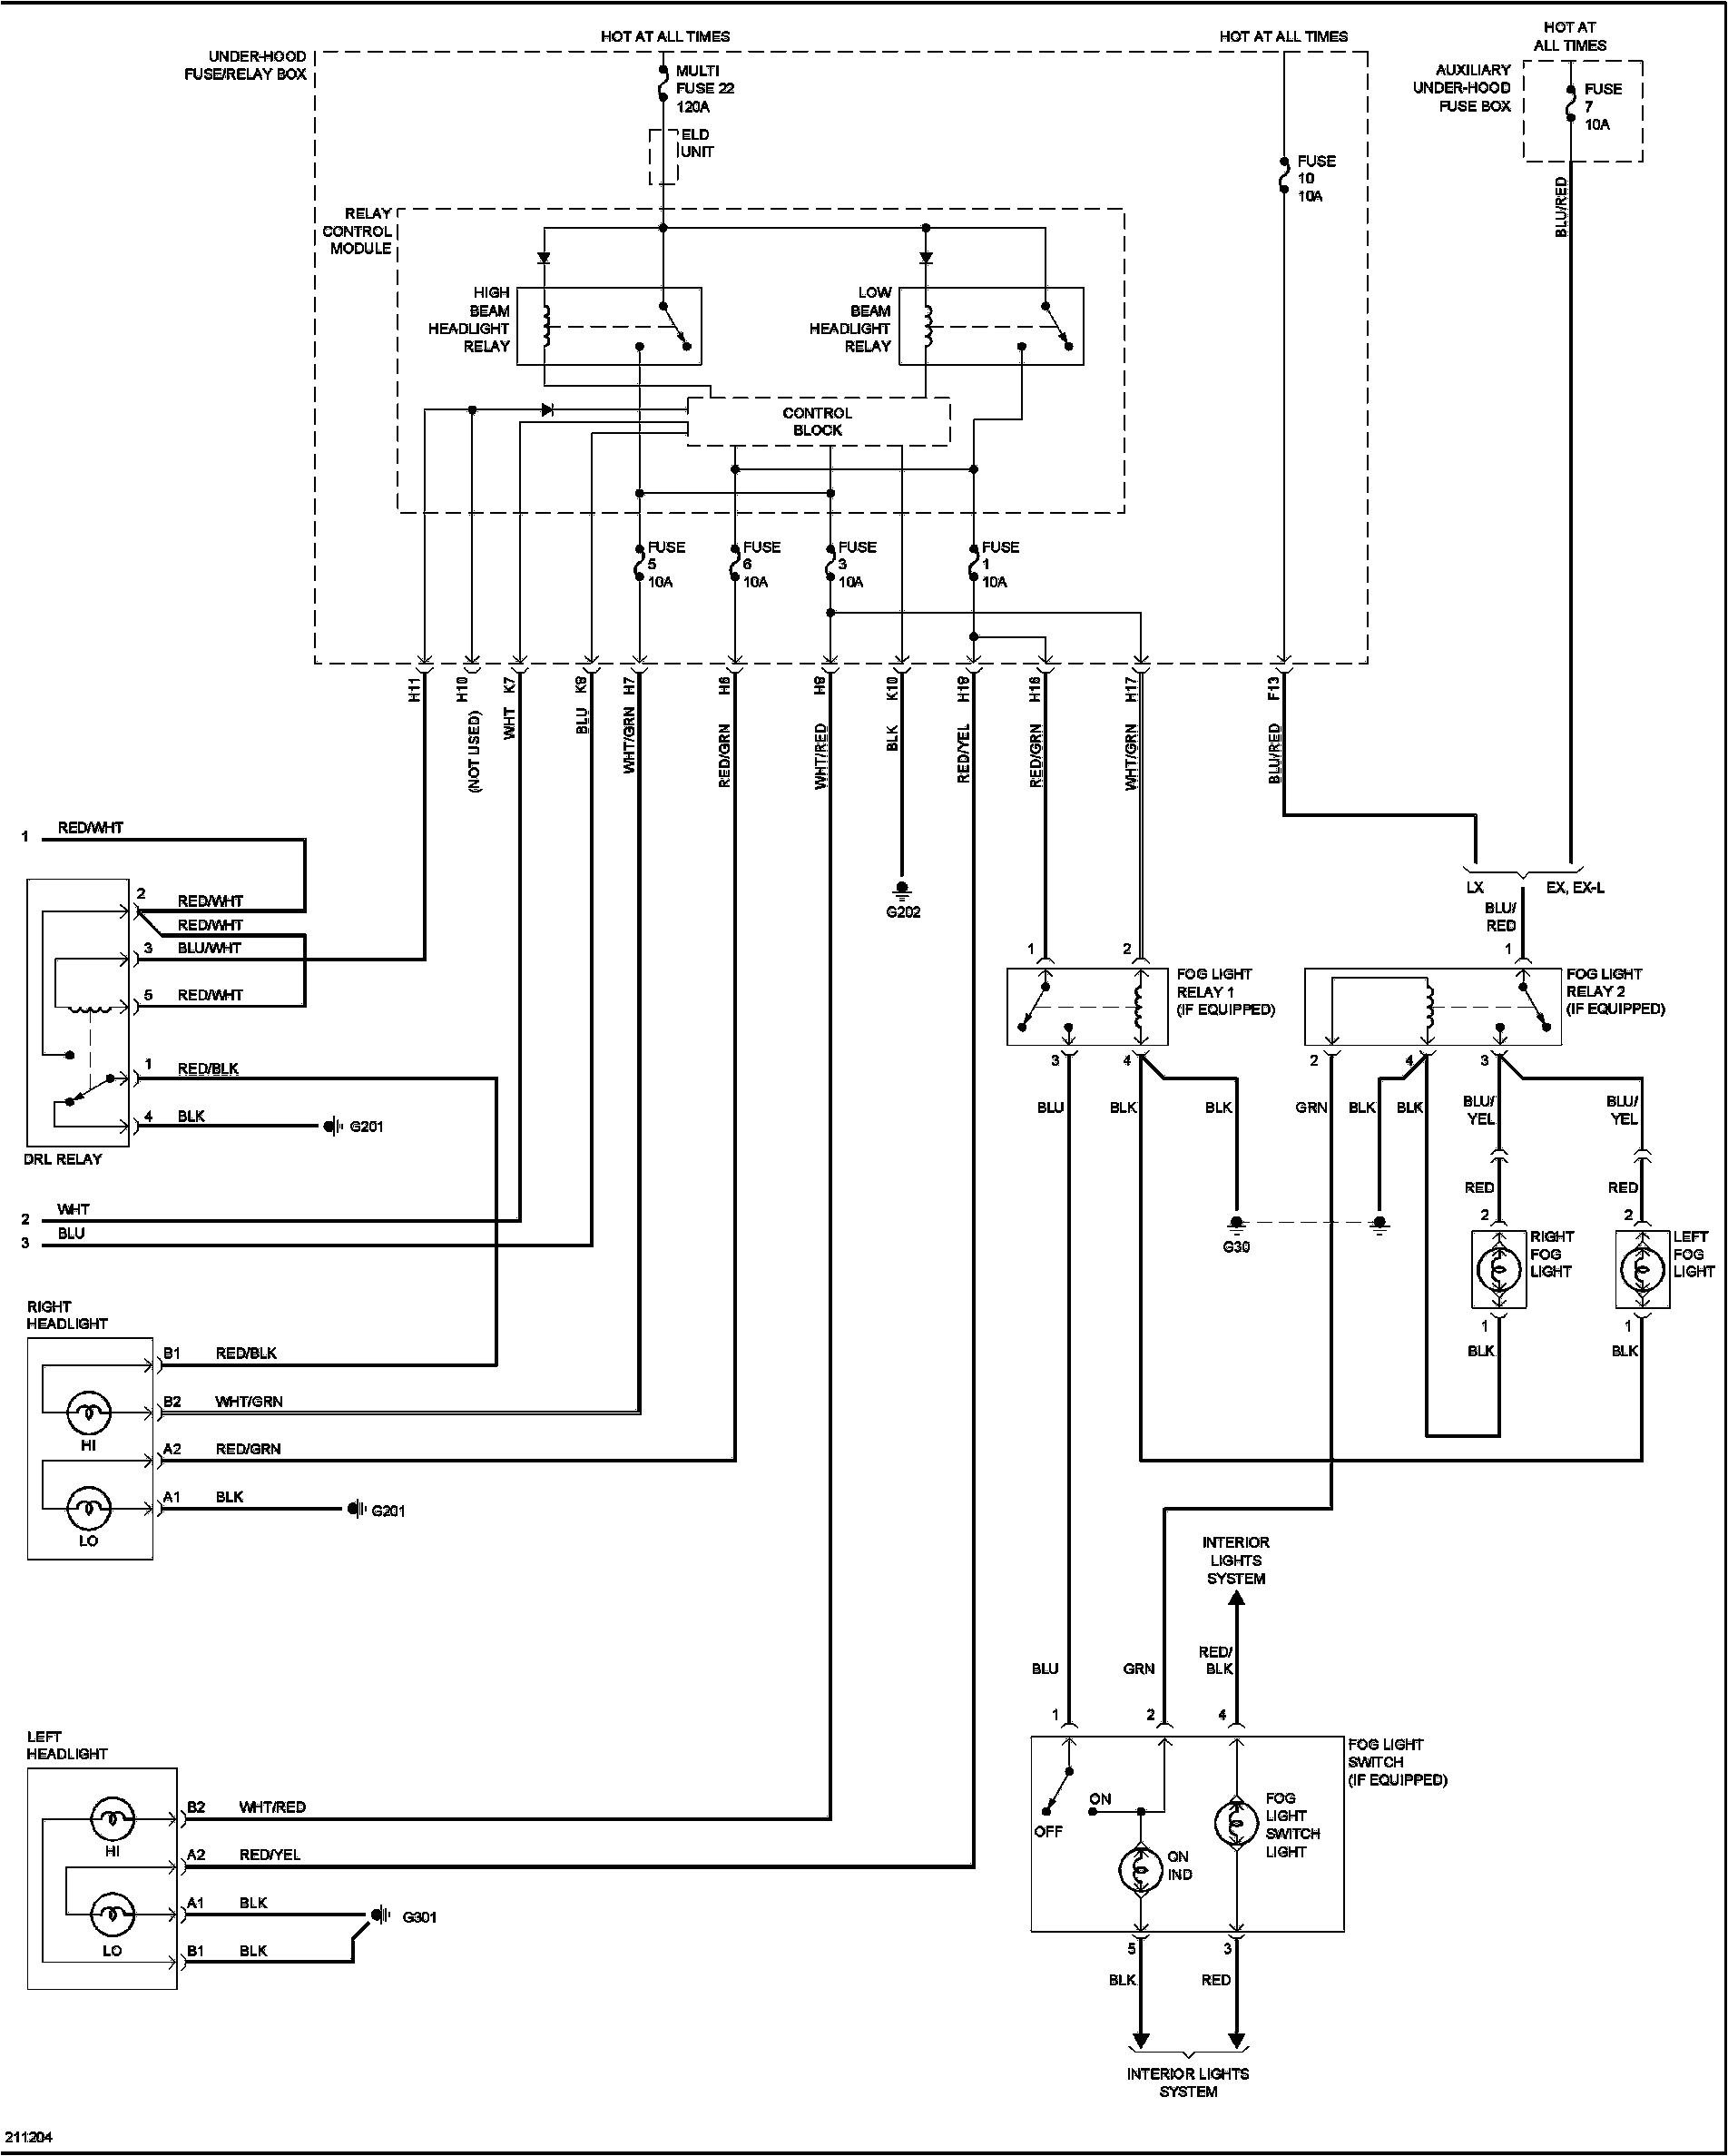 2002 honda civic ac wiring diagram wiring diagram name 2008 honda civic wiring diagram 2006 honda